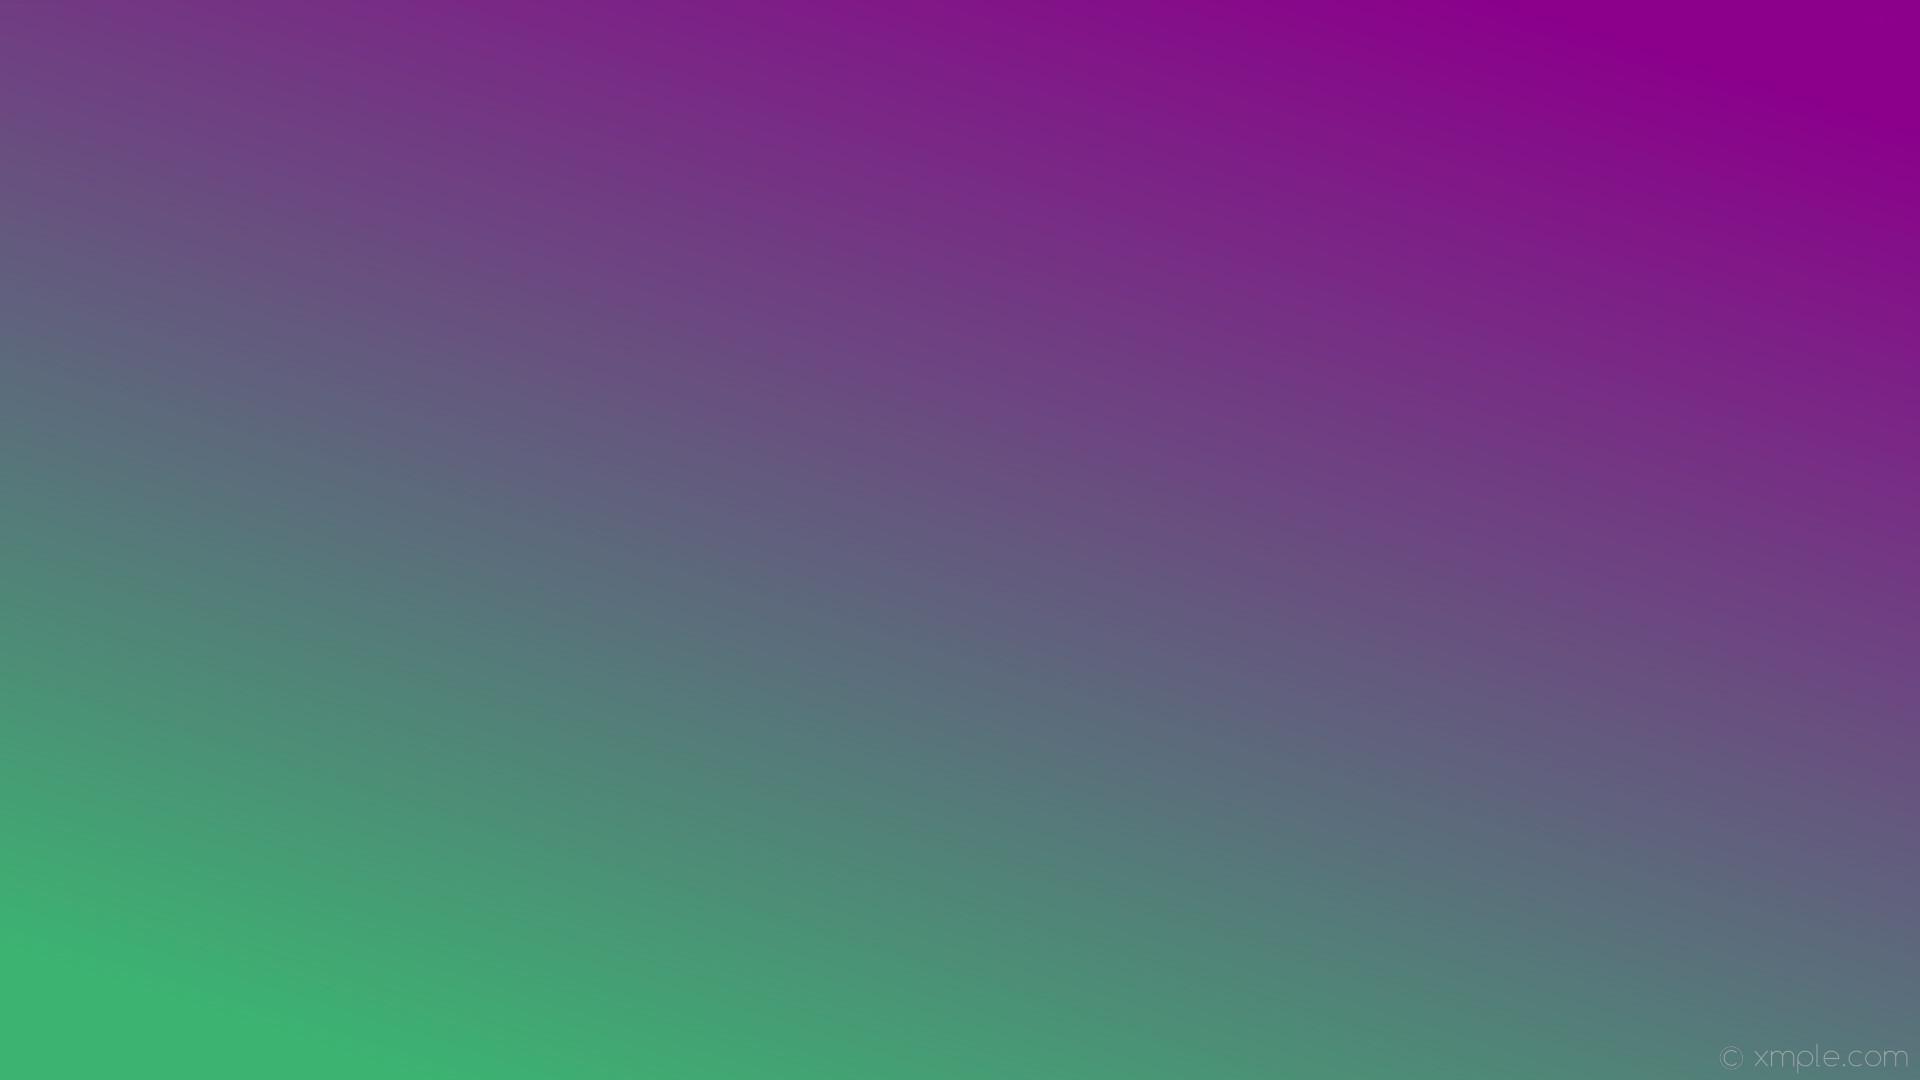 wallpaper linear purple green gradient medium sea green dark magenta  #3cb371 #8b008b 225°